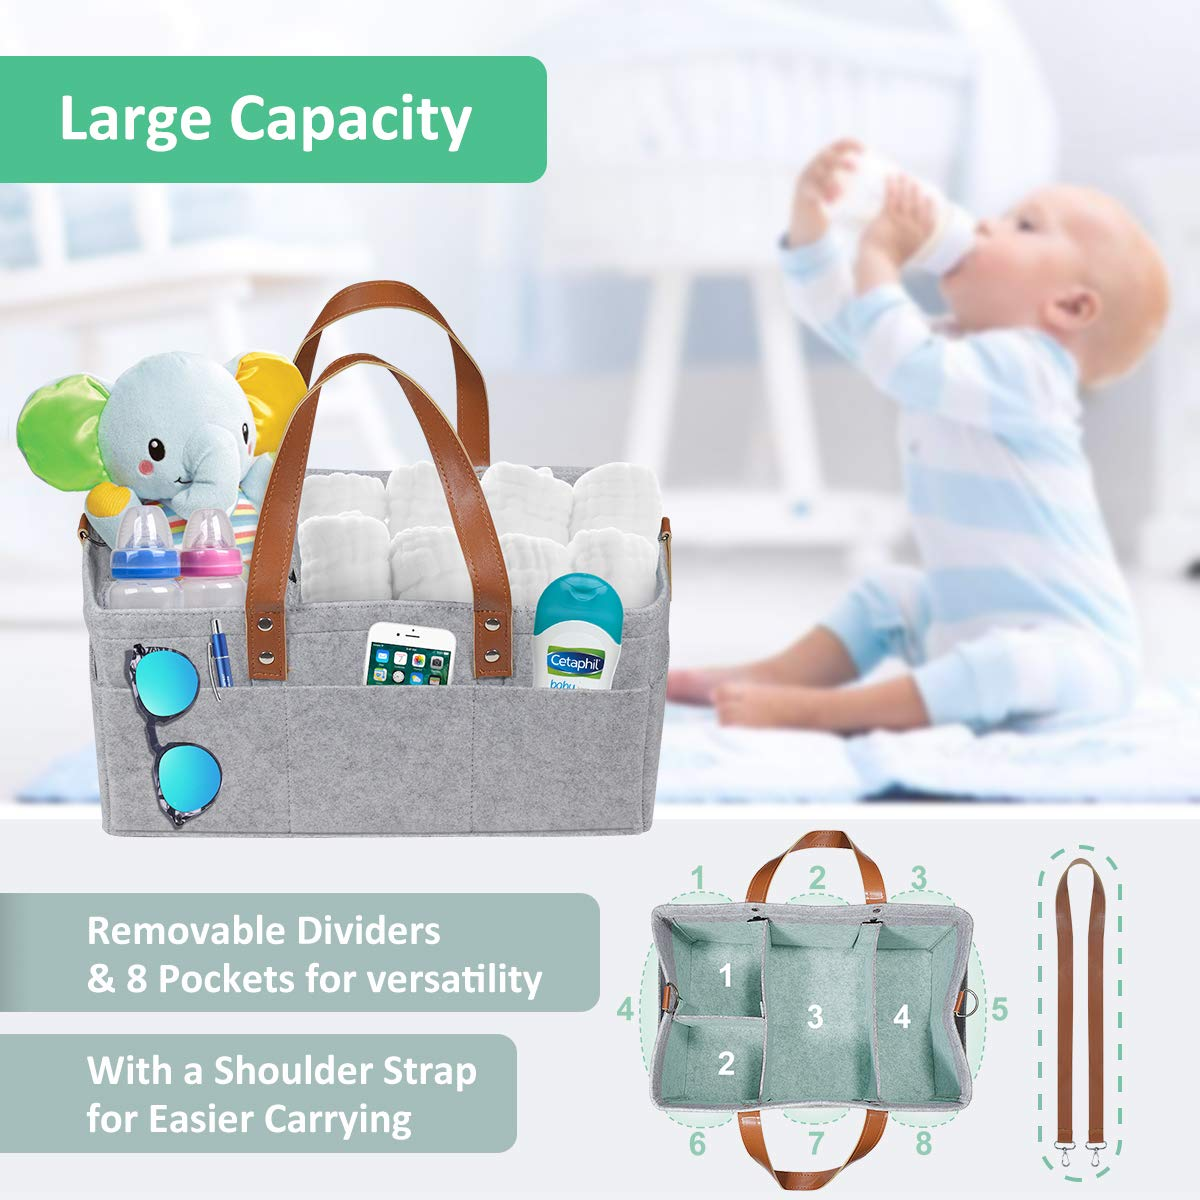 Baby Basket For Boys Girls AlroamGn Baby Diaper Caddy Organizer with Muslin Burp Cloths Large Portable Travel Car Organizer Nursery Storage Bin